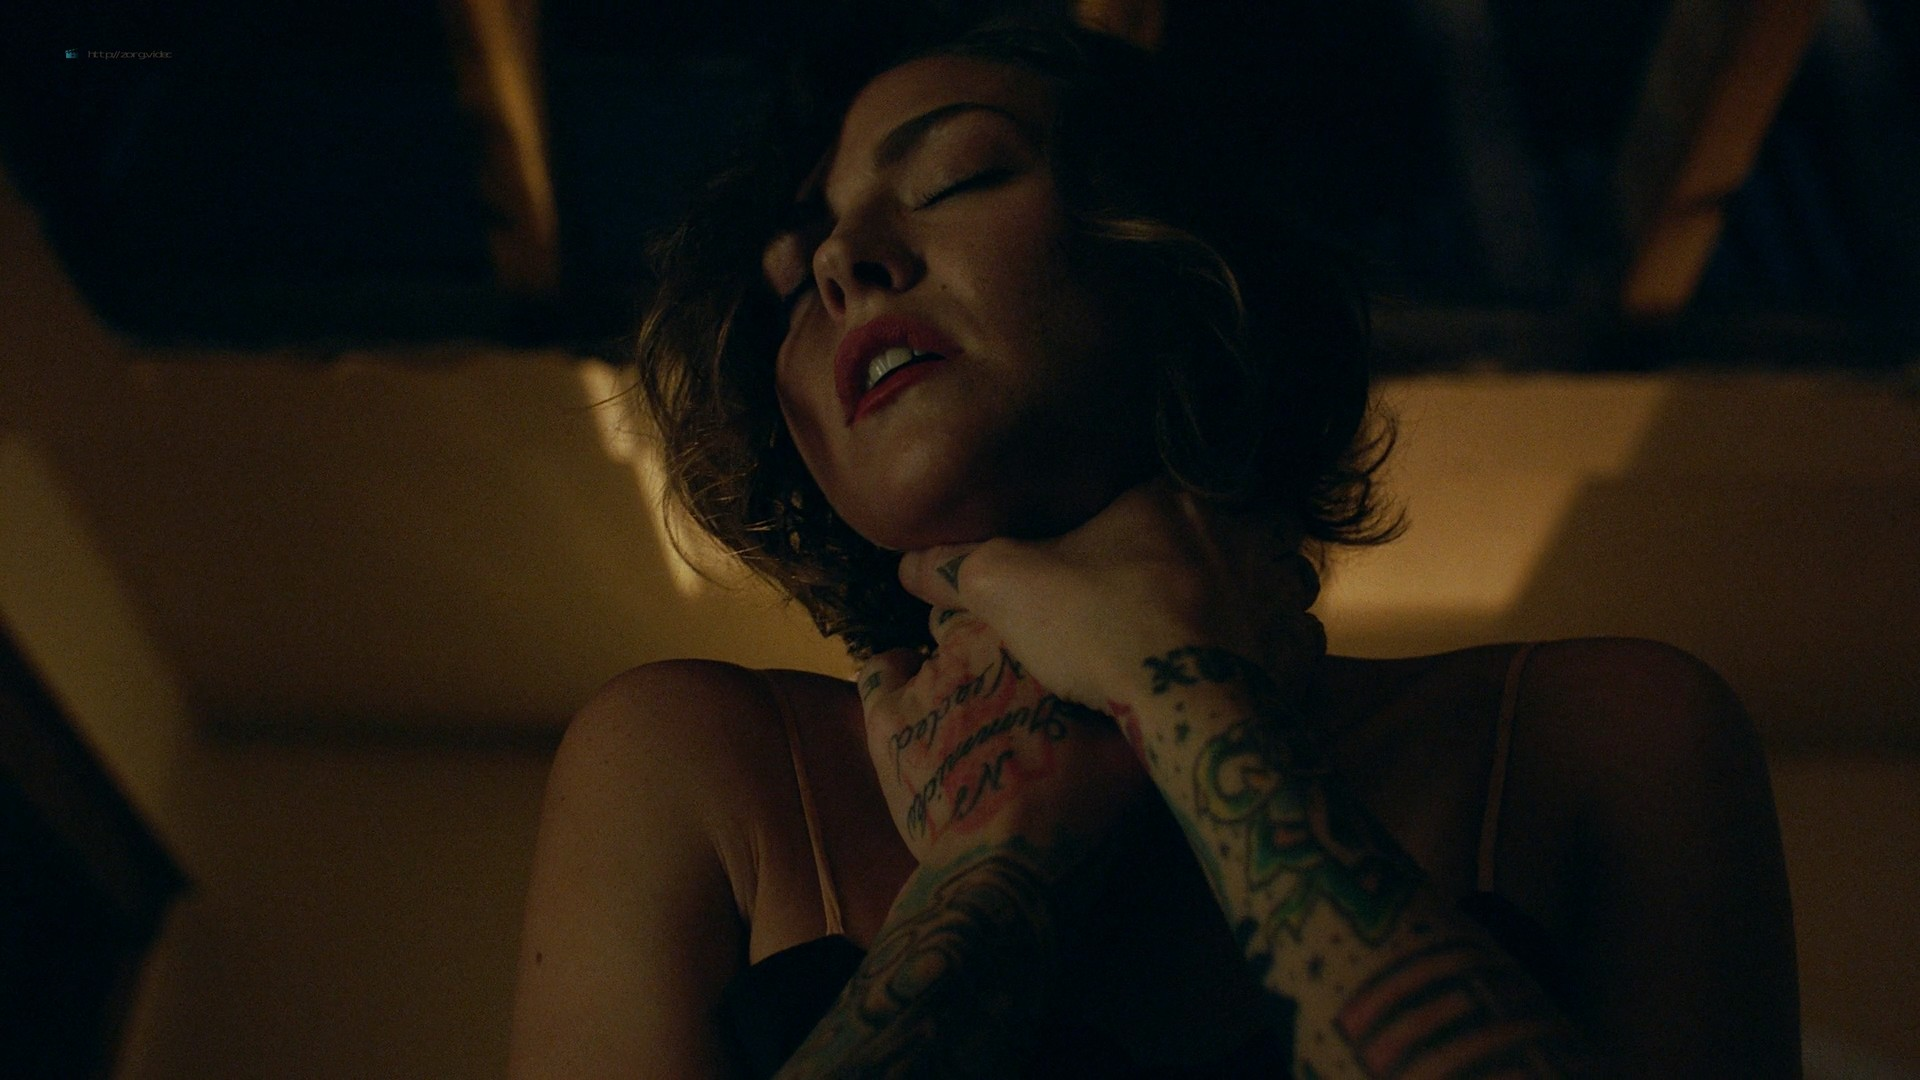 Trieste Kelly Dunn hot and Sarah Brooks nude sideboob - Girl on the Third Floor (2019) 1080 Web (11)